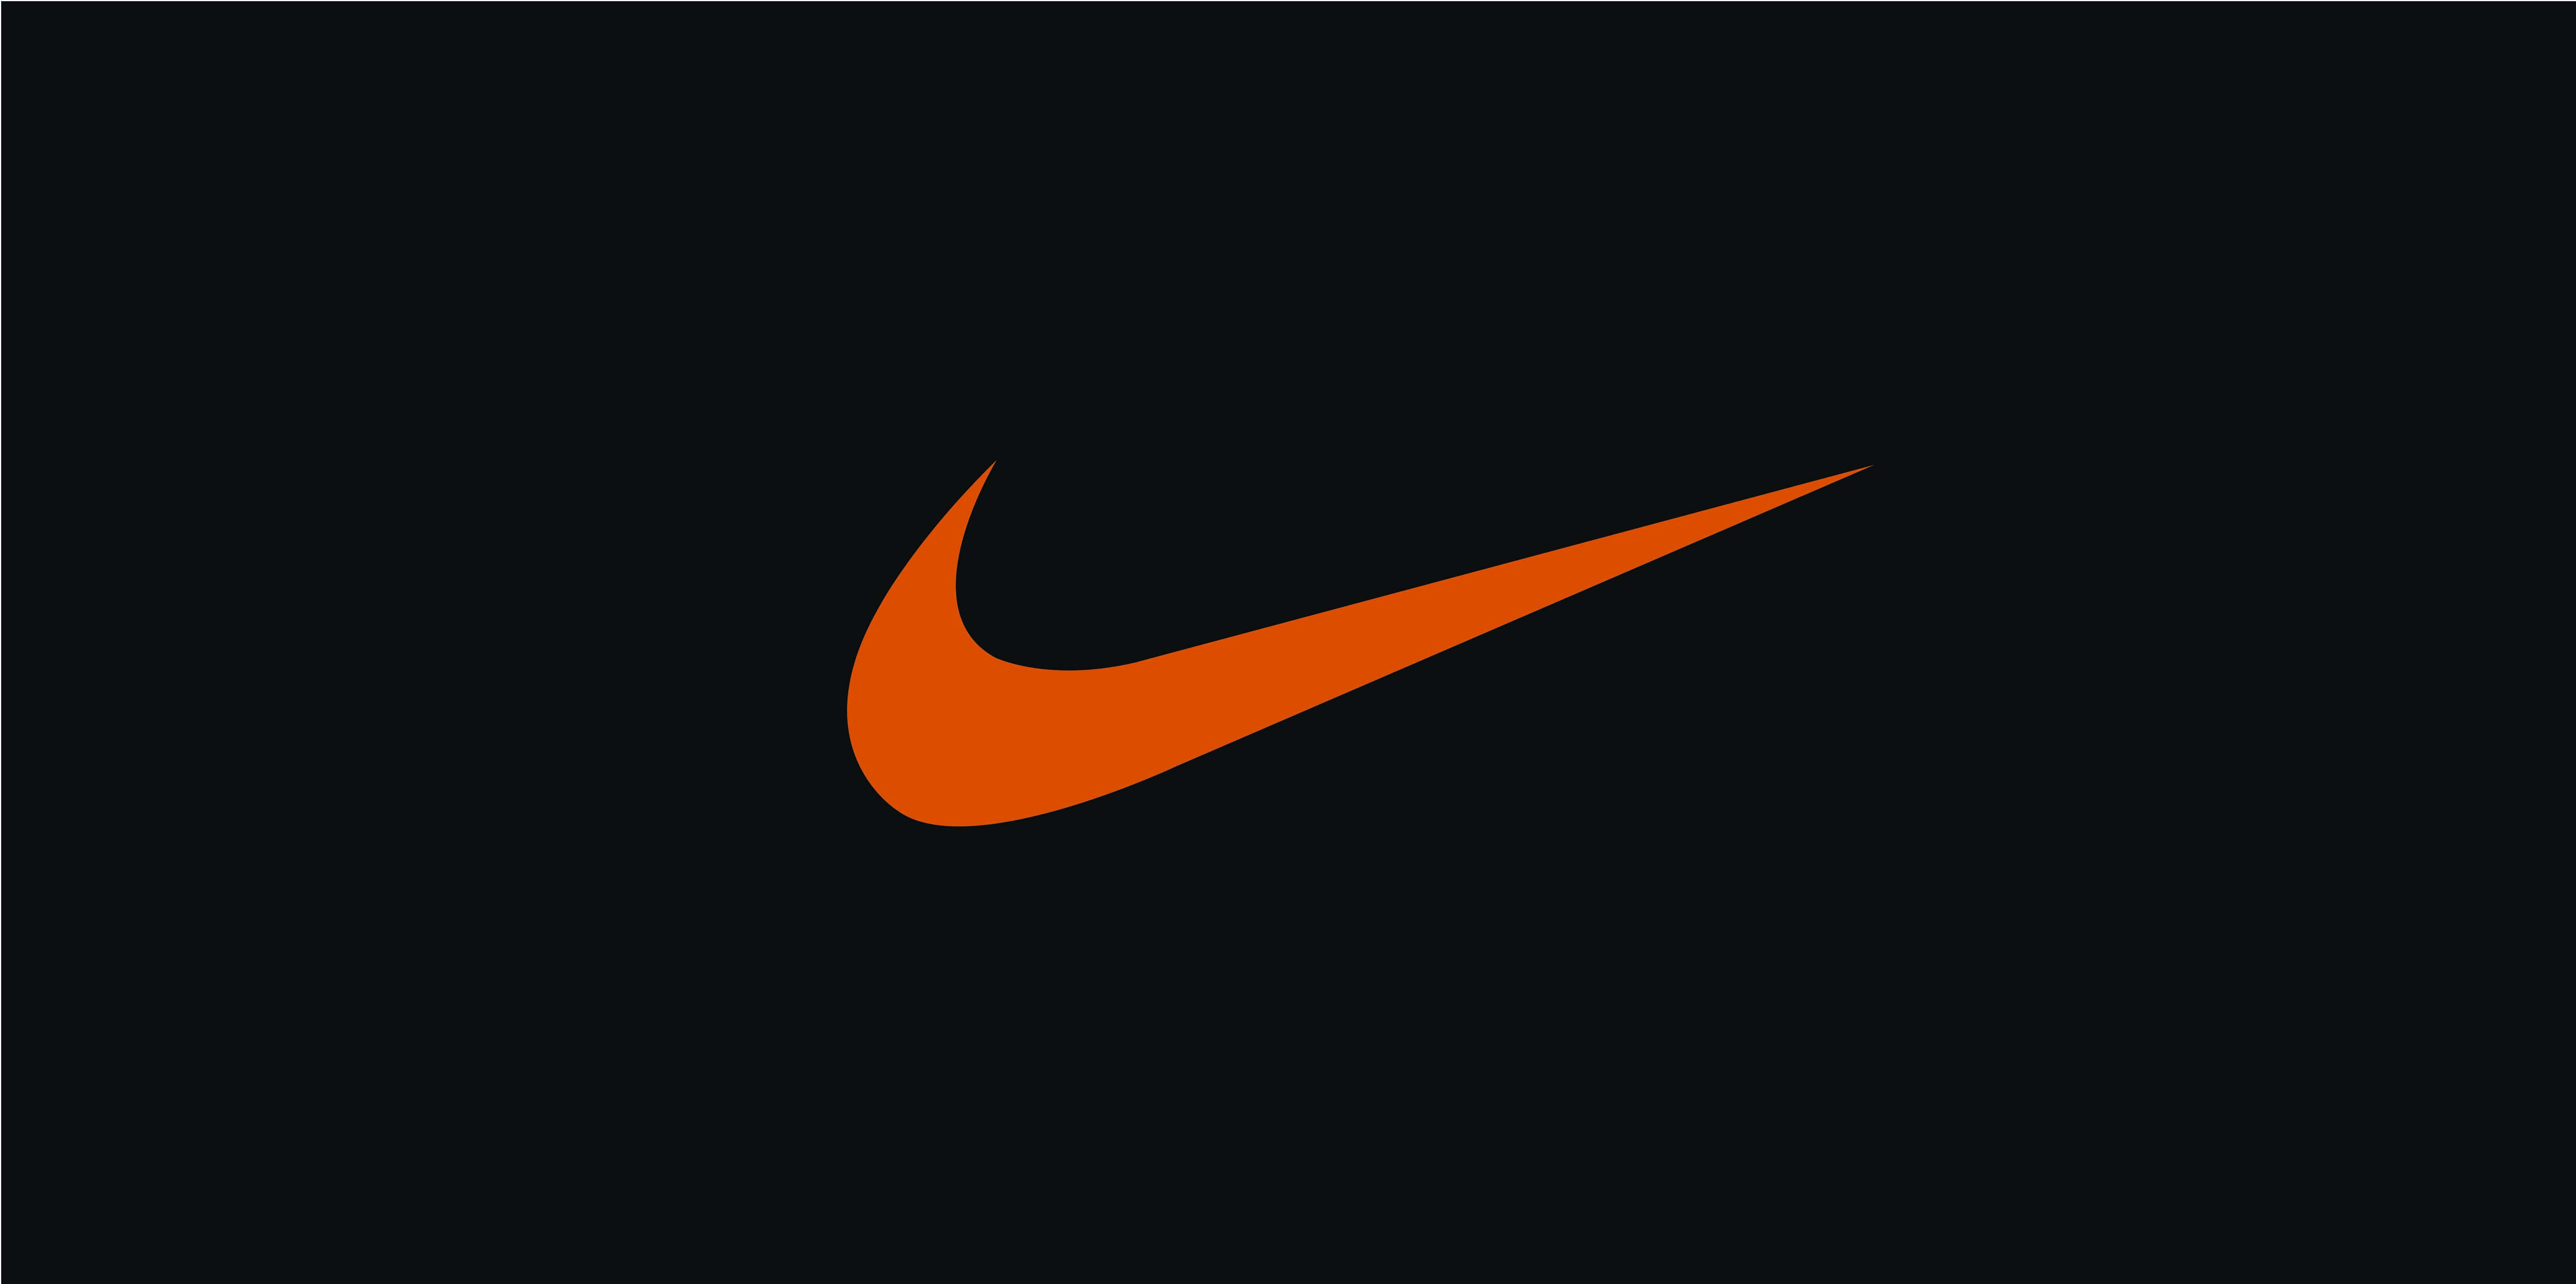 Nike Logo Wallpapers HD 2015 download 6544x3263